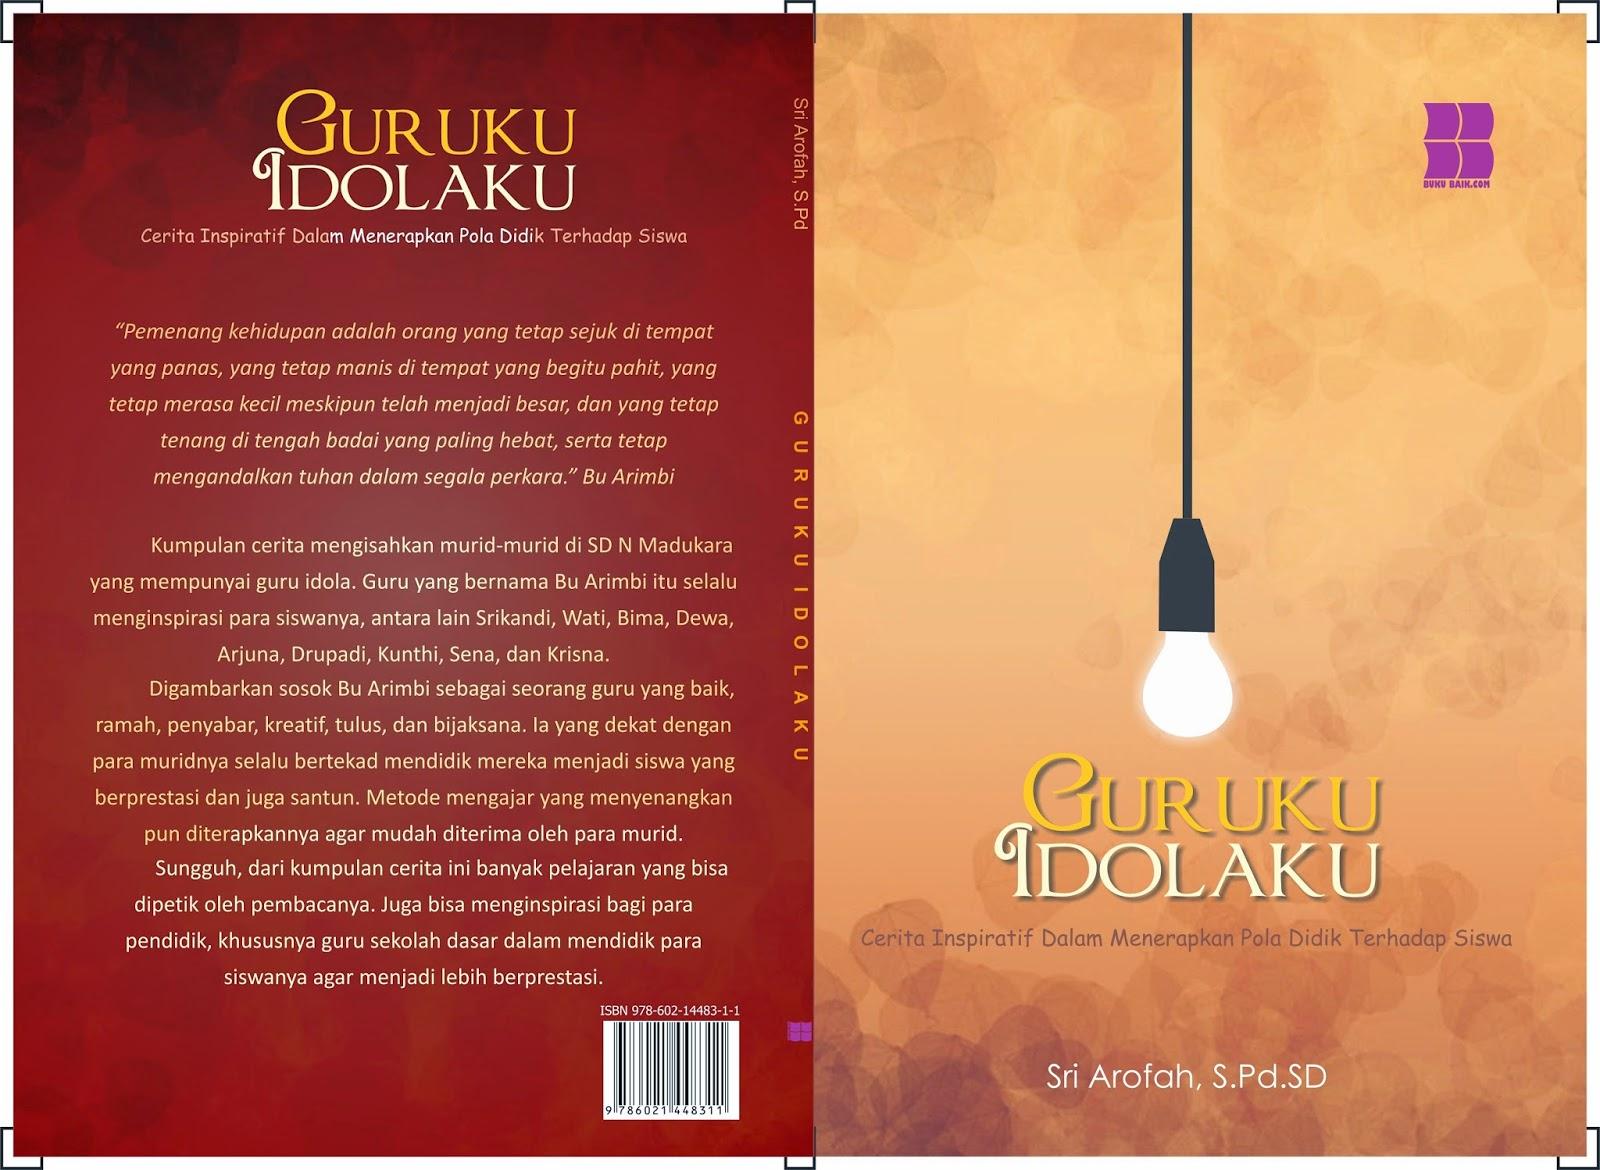 Penerbit Buku Baik Contoh Sampul Buku Sederhana Yang Sudah Terbit Di Buku Baik Dan Sibuku